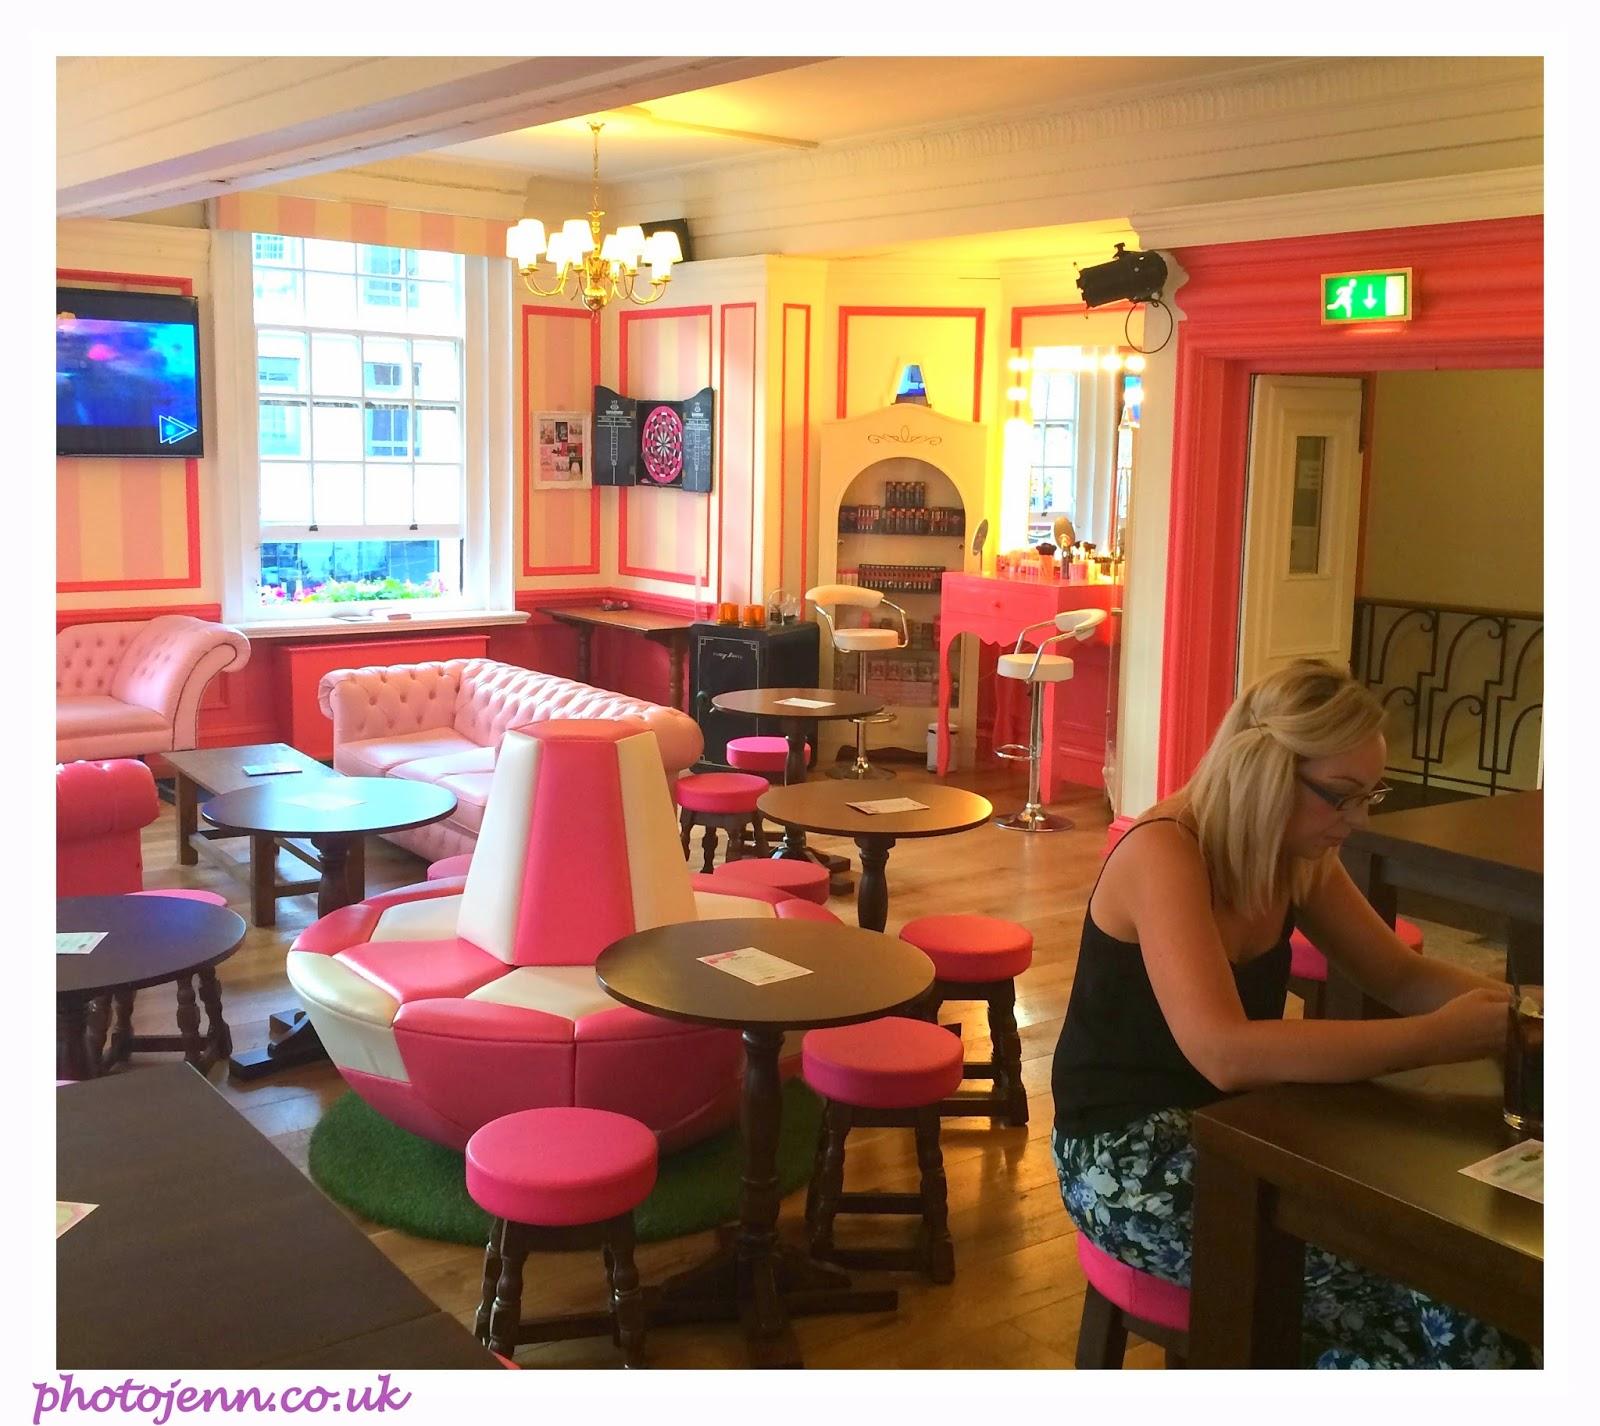 gabbis-head-benefit-cosmetics-pub-pink-girls-bar